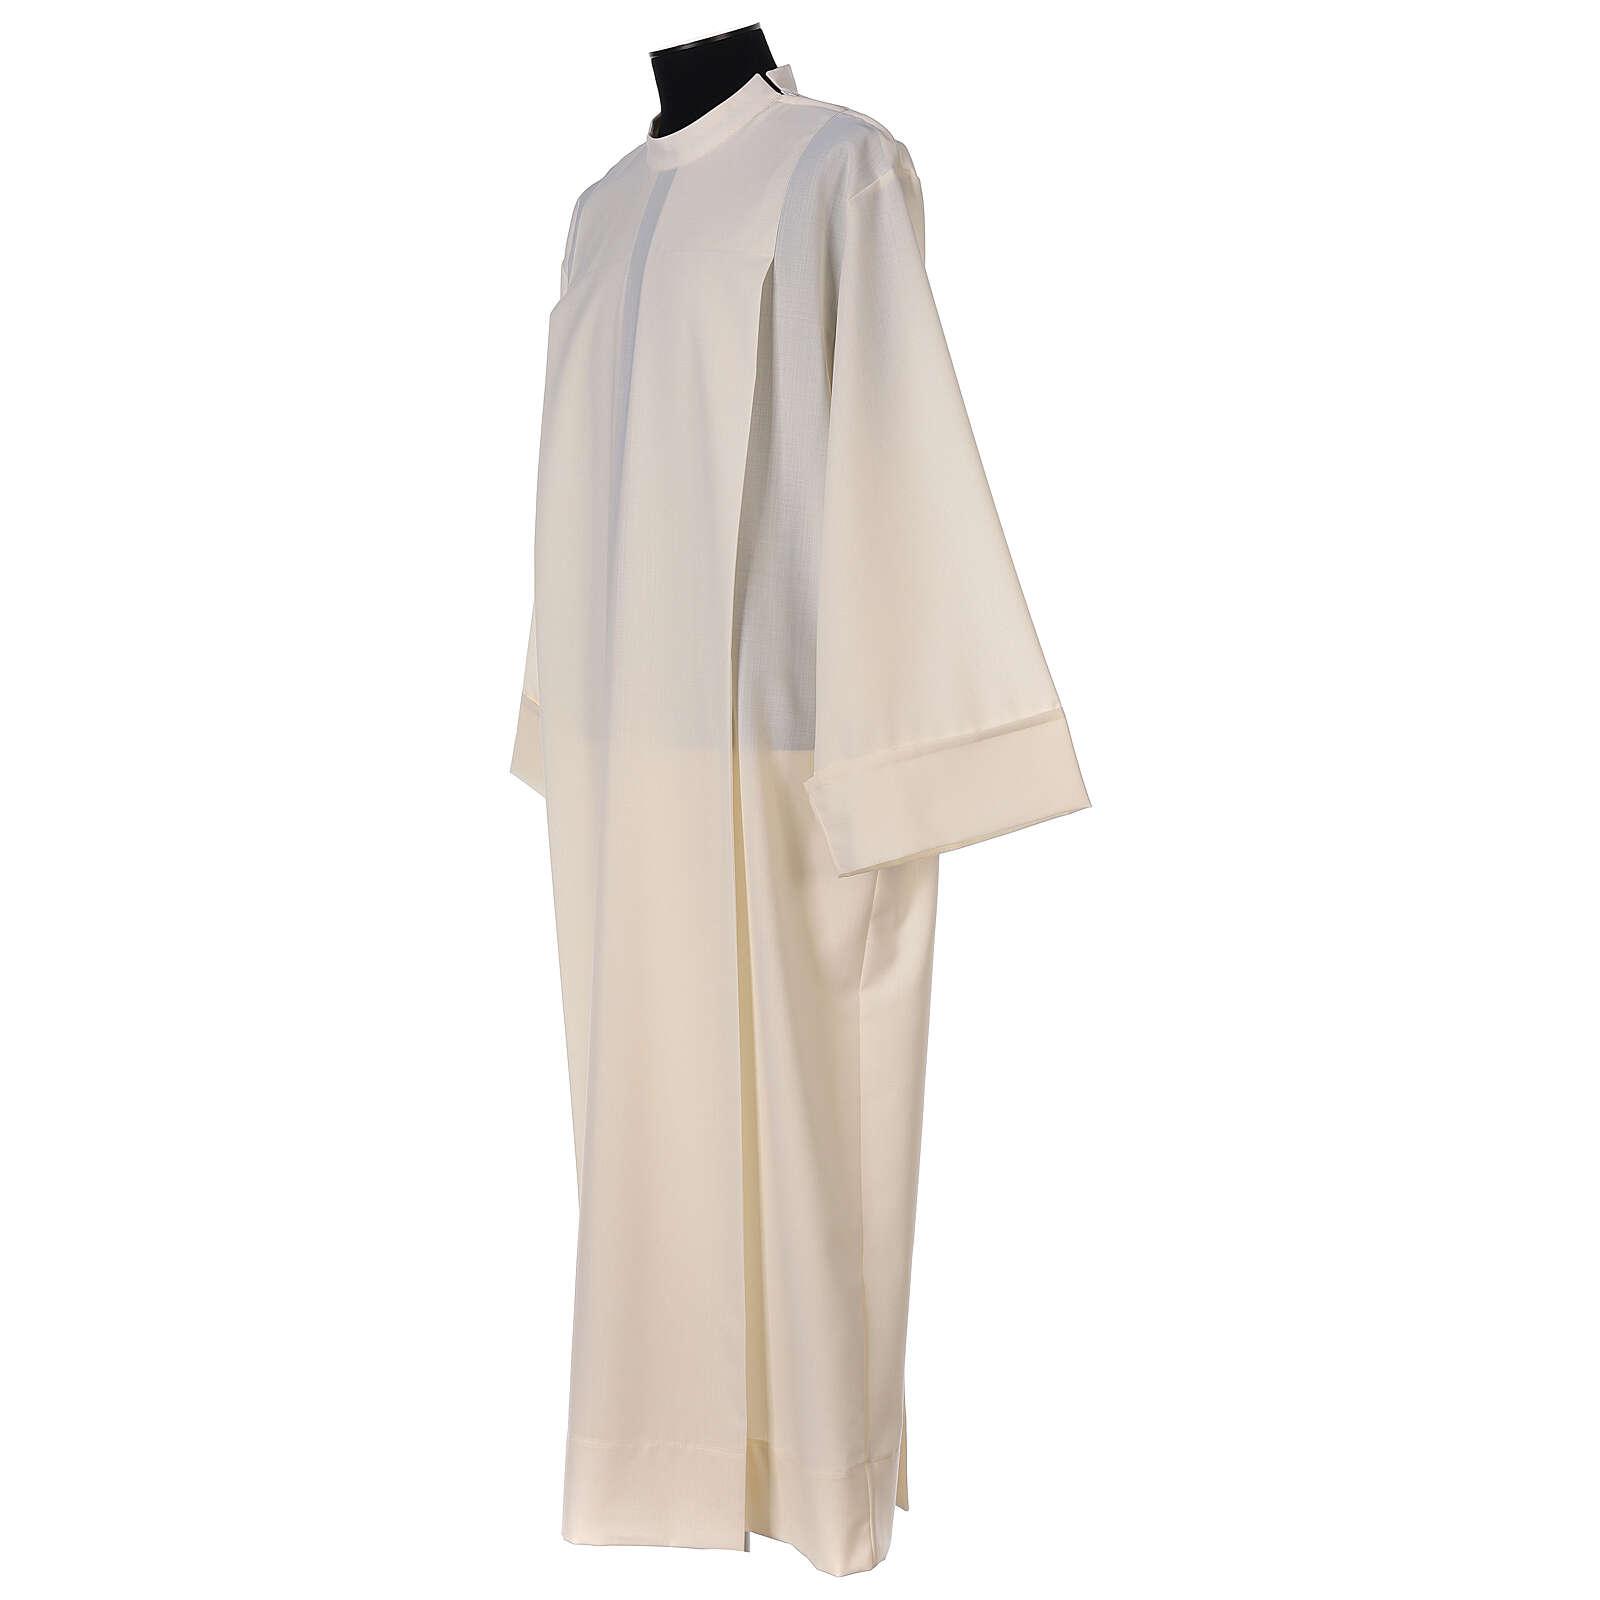 Alva cor de marfim 55% poliéster 45% lã 2 pregas fecho de correr ombro 4